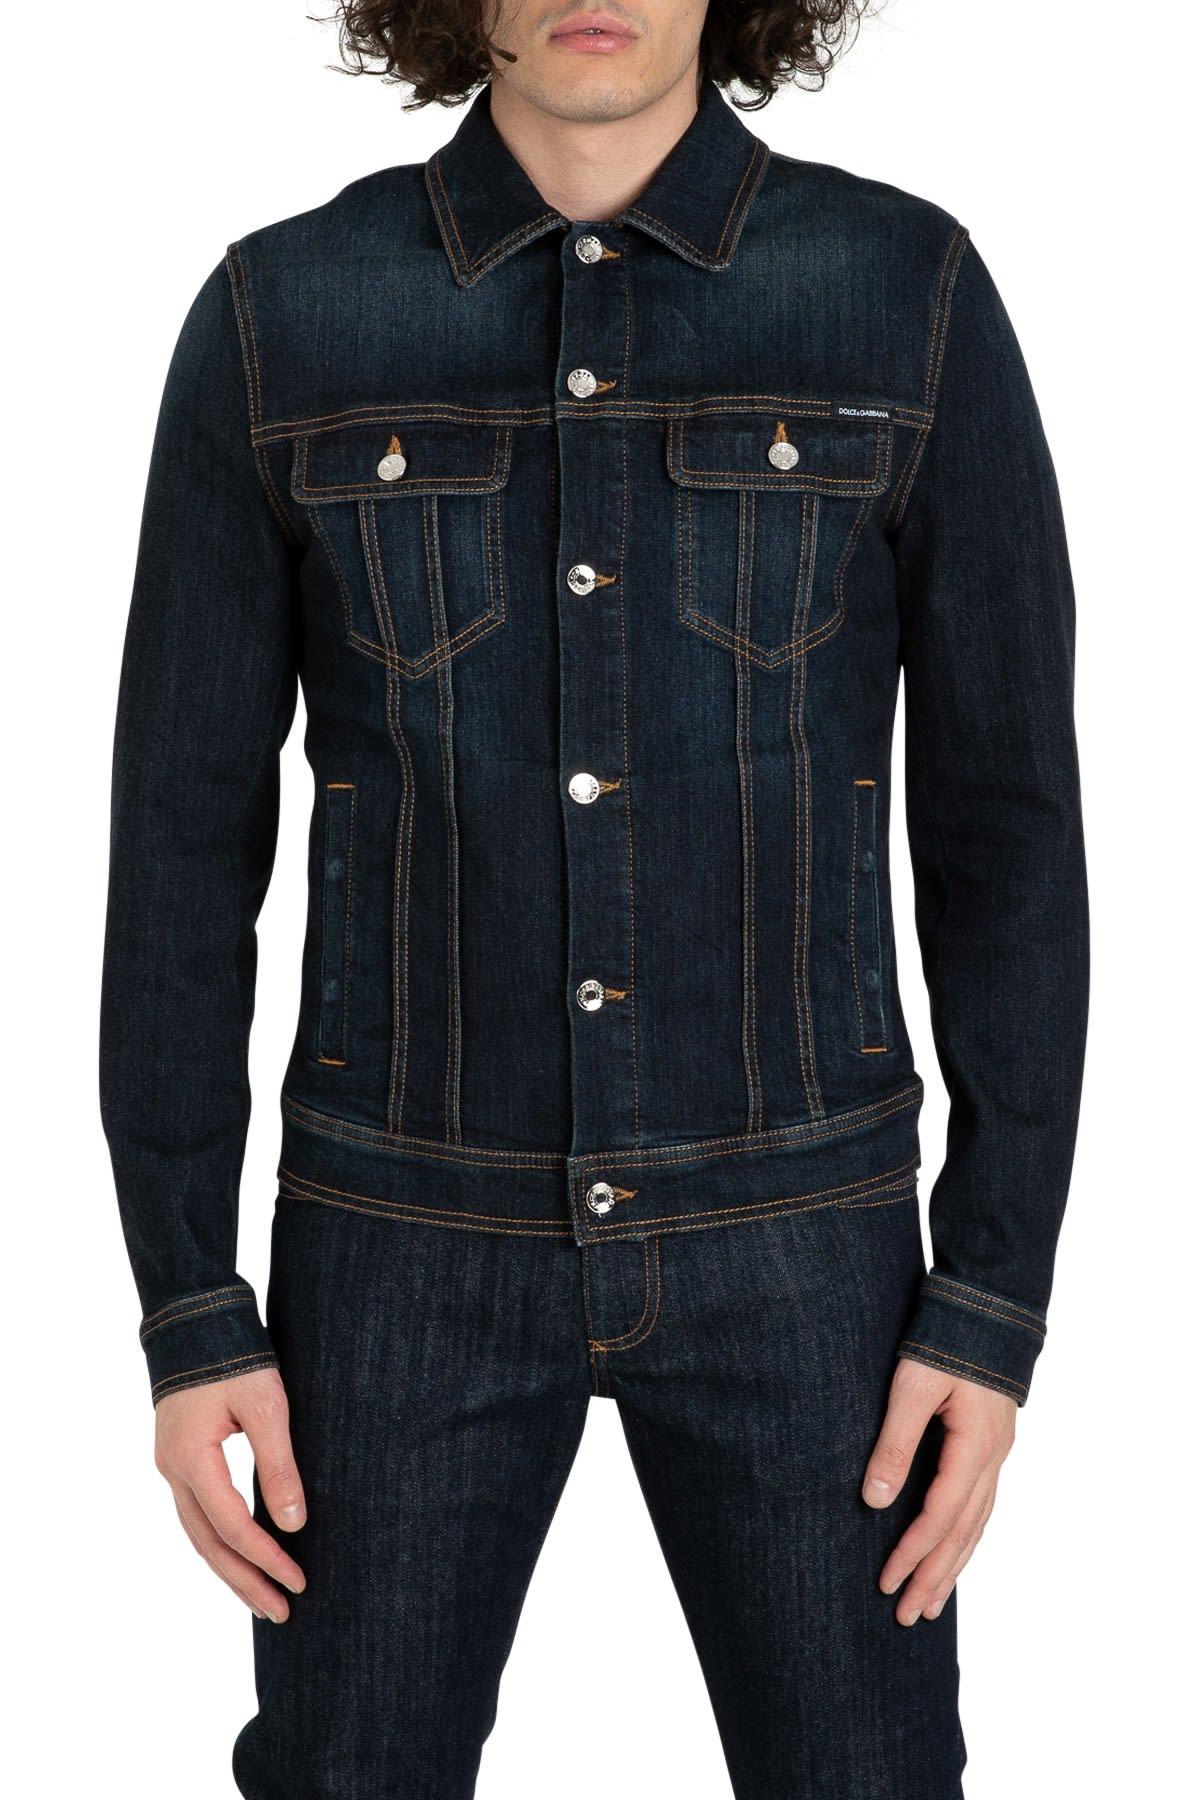 Dolce & Gabbana Denim Jacket With Logo Patch On Back